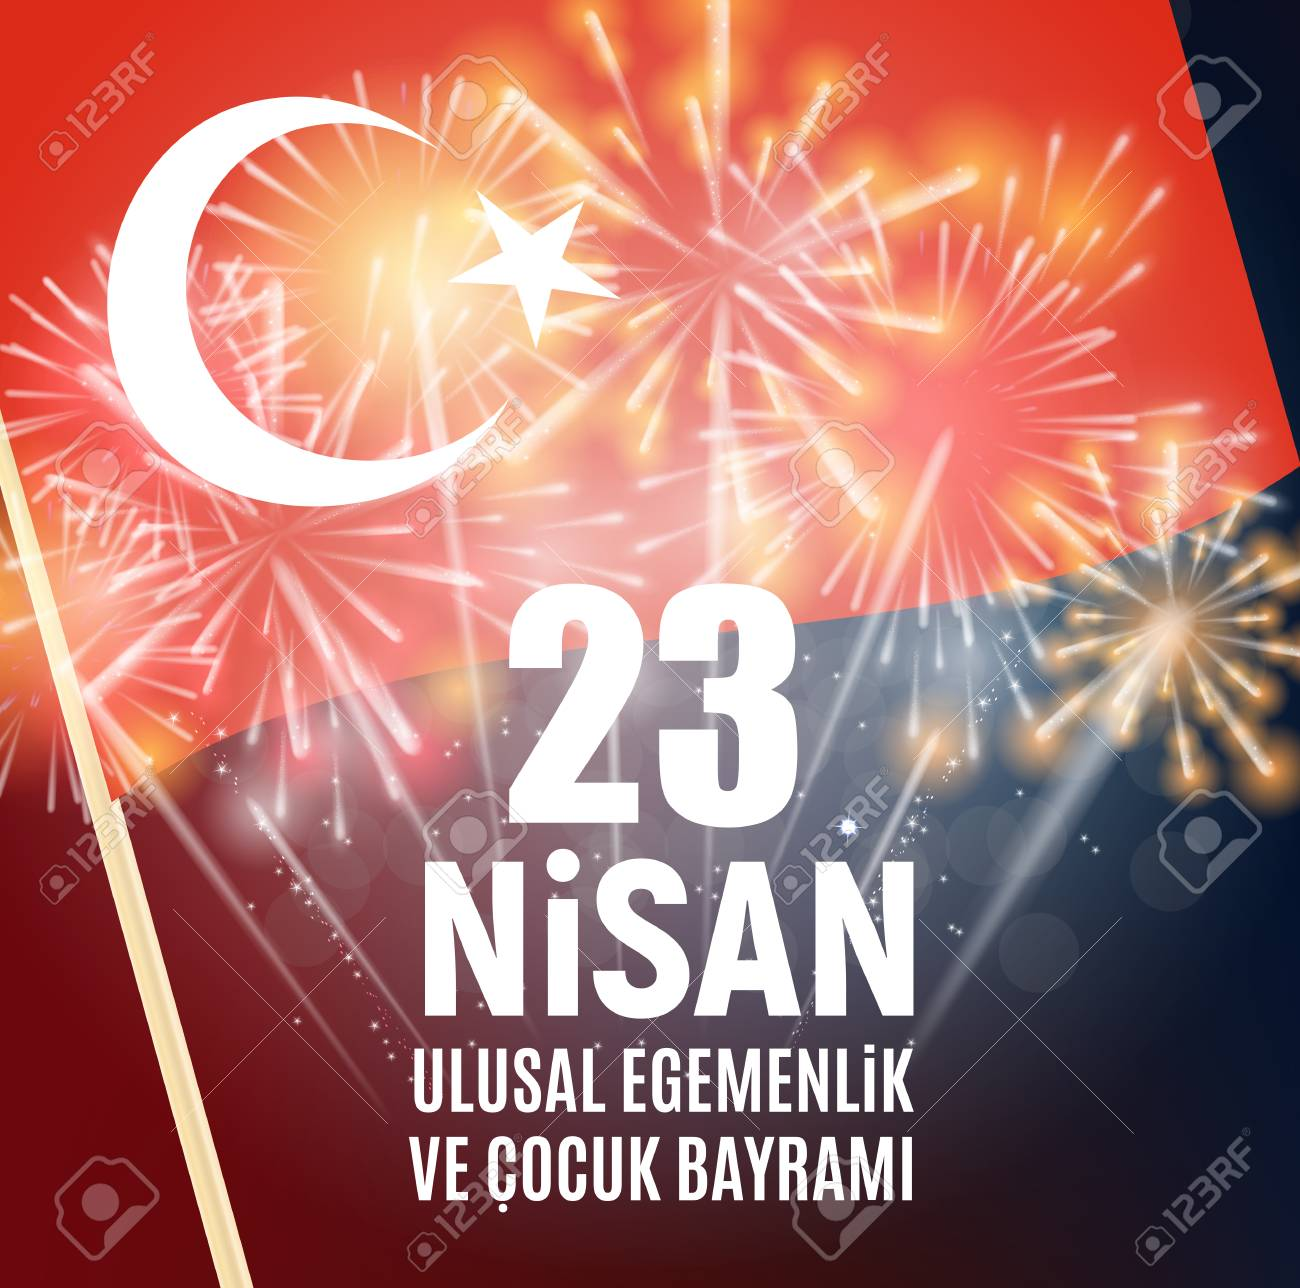 23 april childrens day poster template vector illustration turkish speak 23 nisan cumhuriyet bayrami